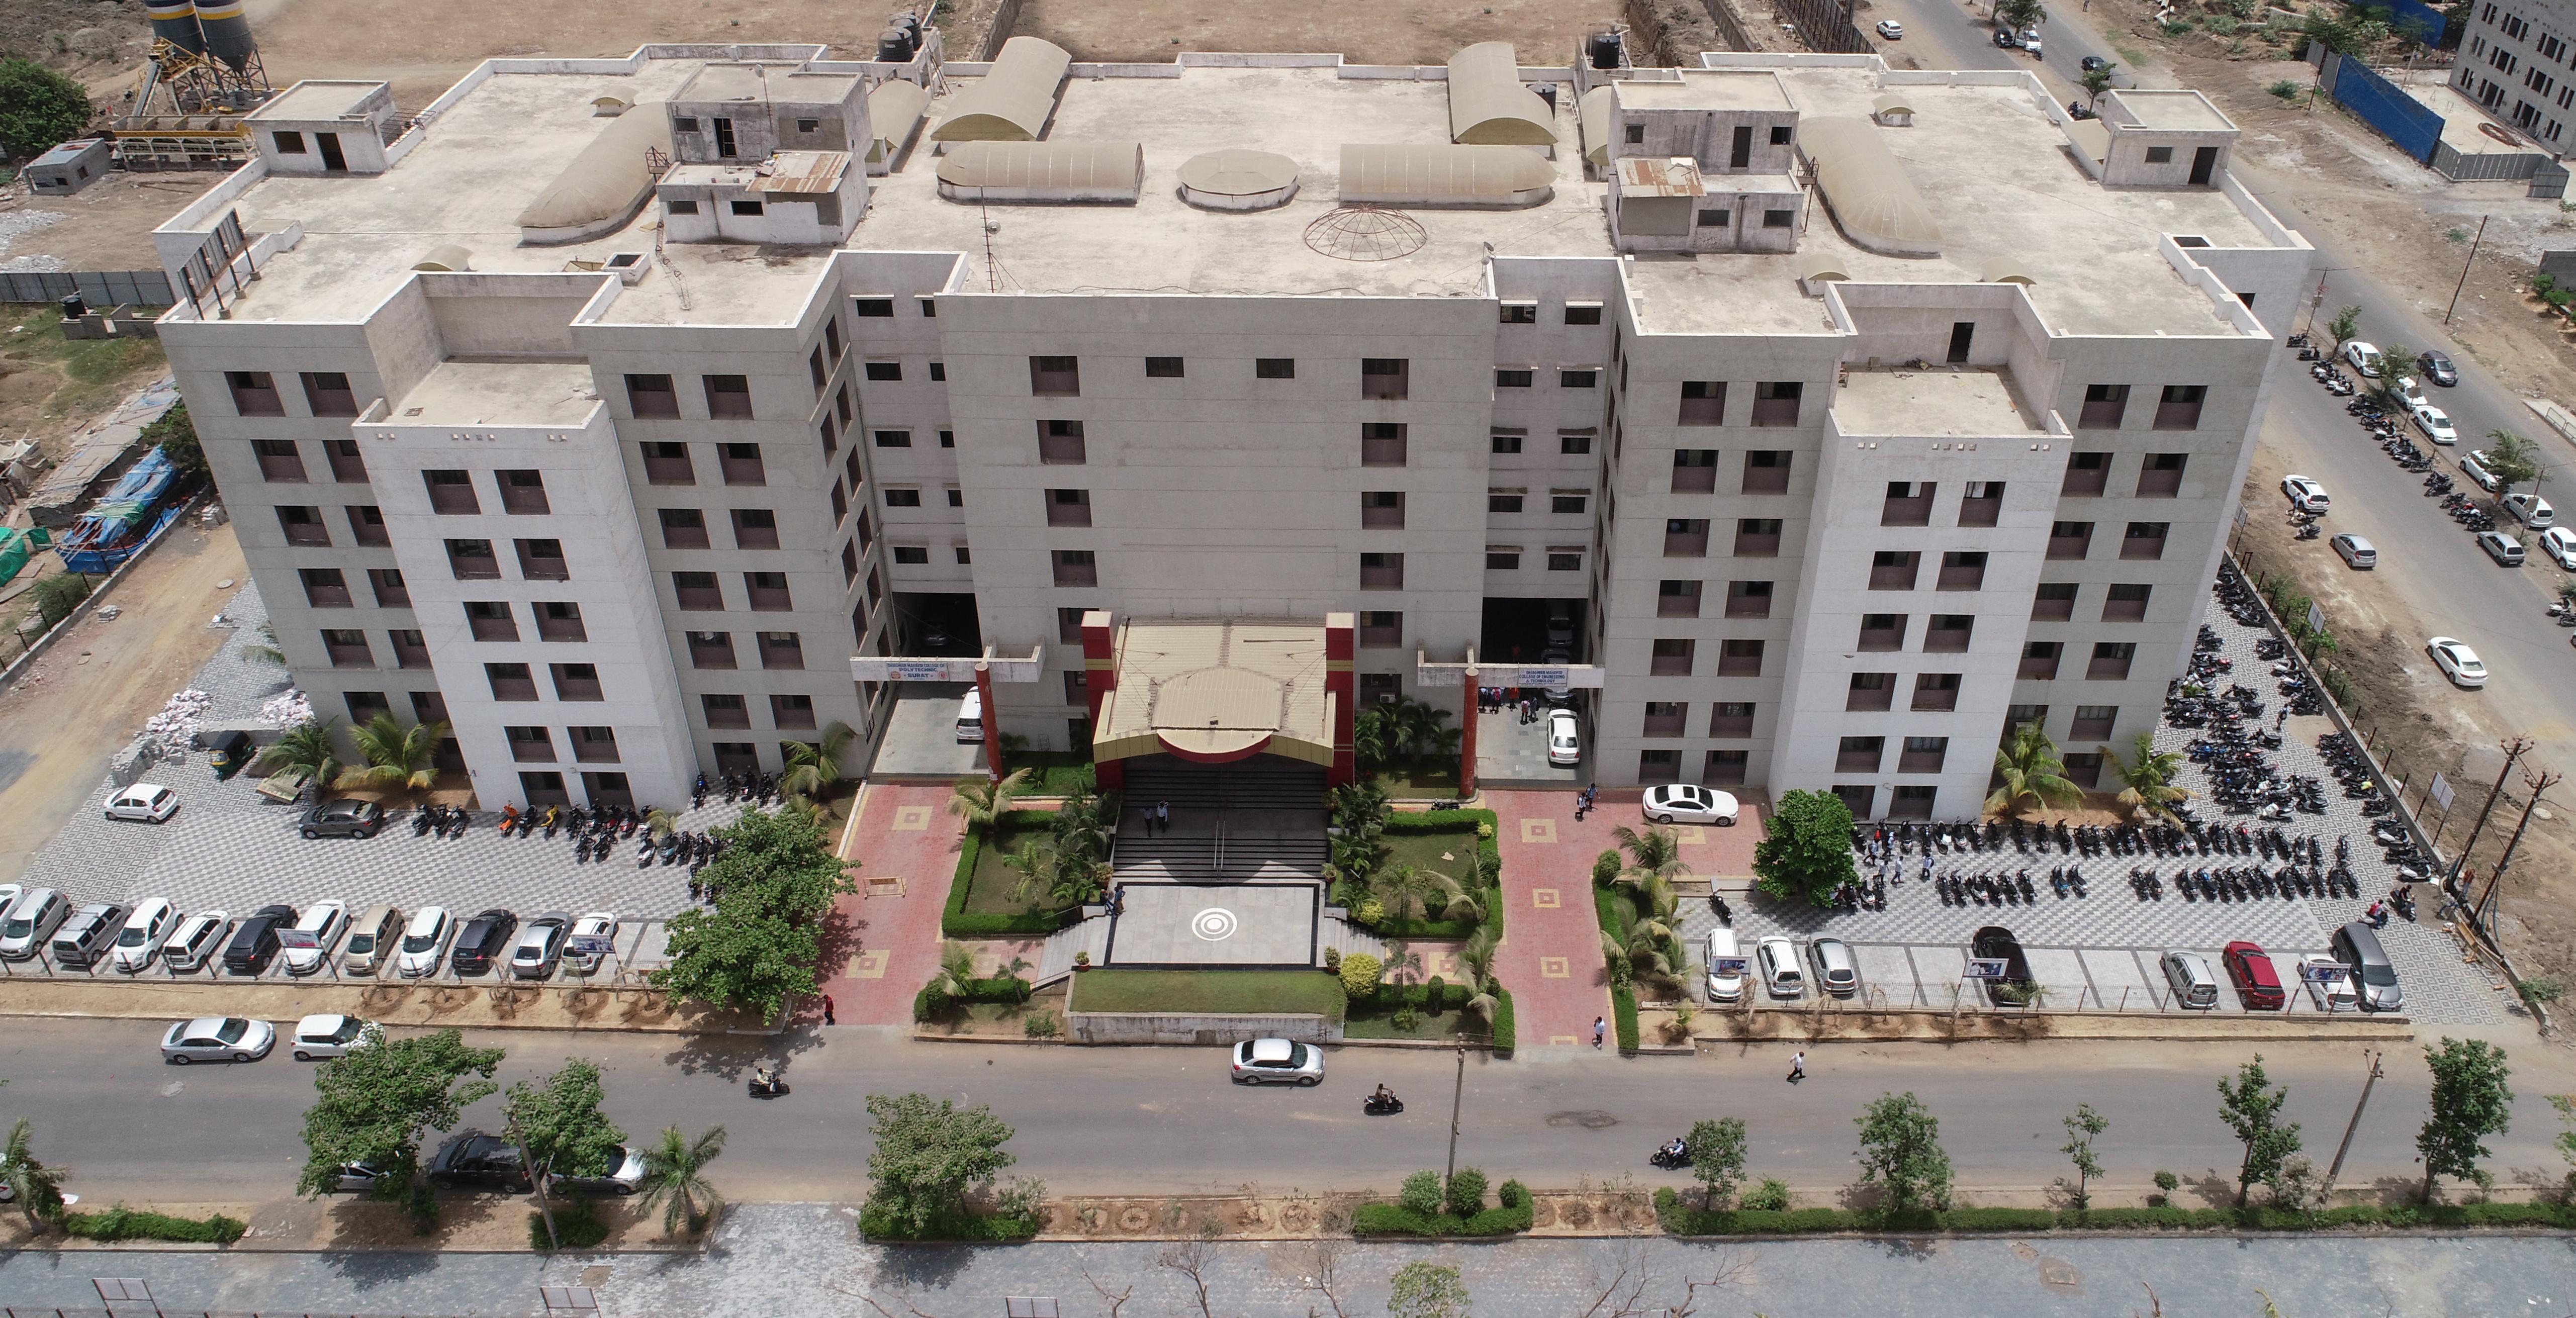 Bhagwan Mahavir College of Science and Technology, Surat